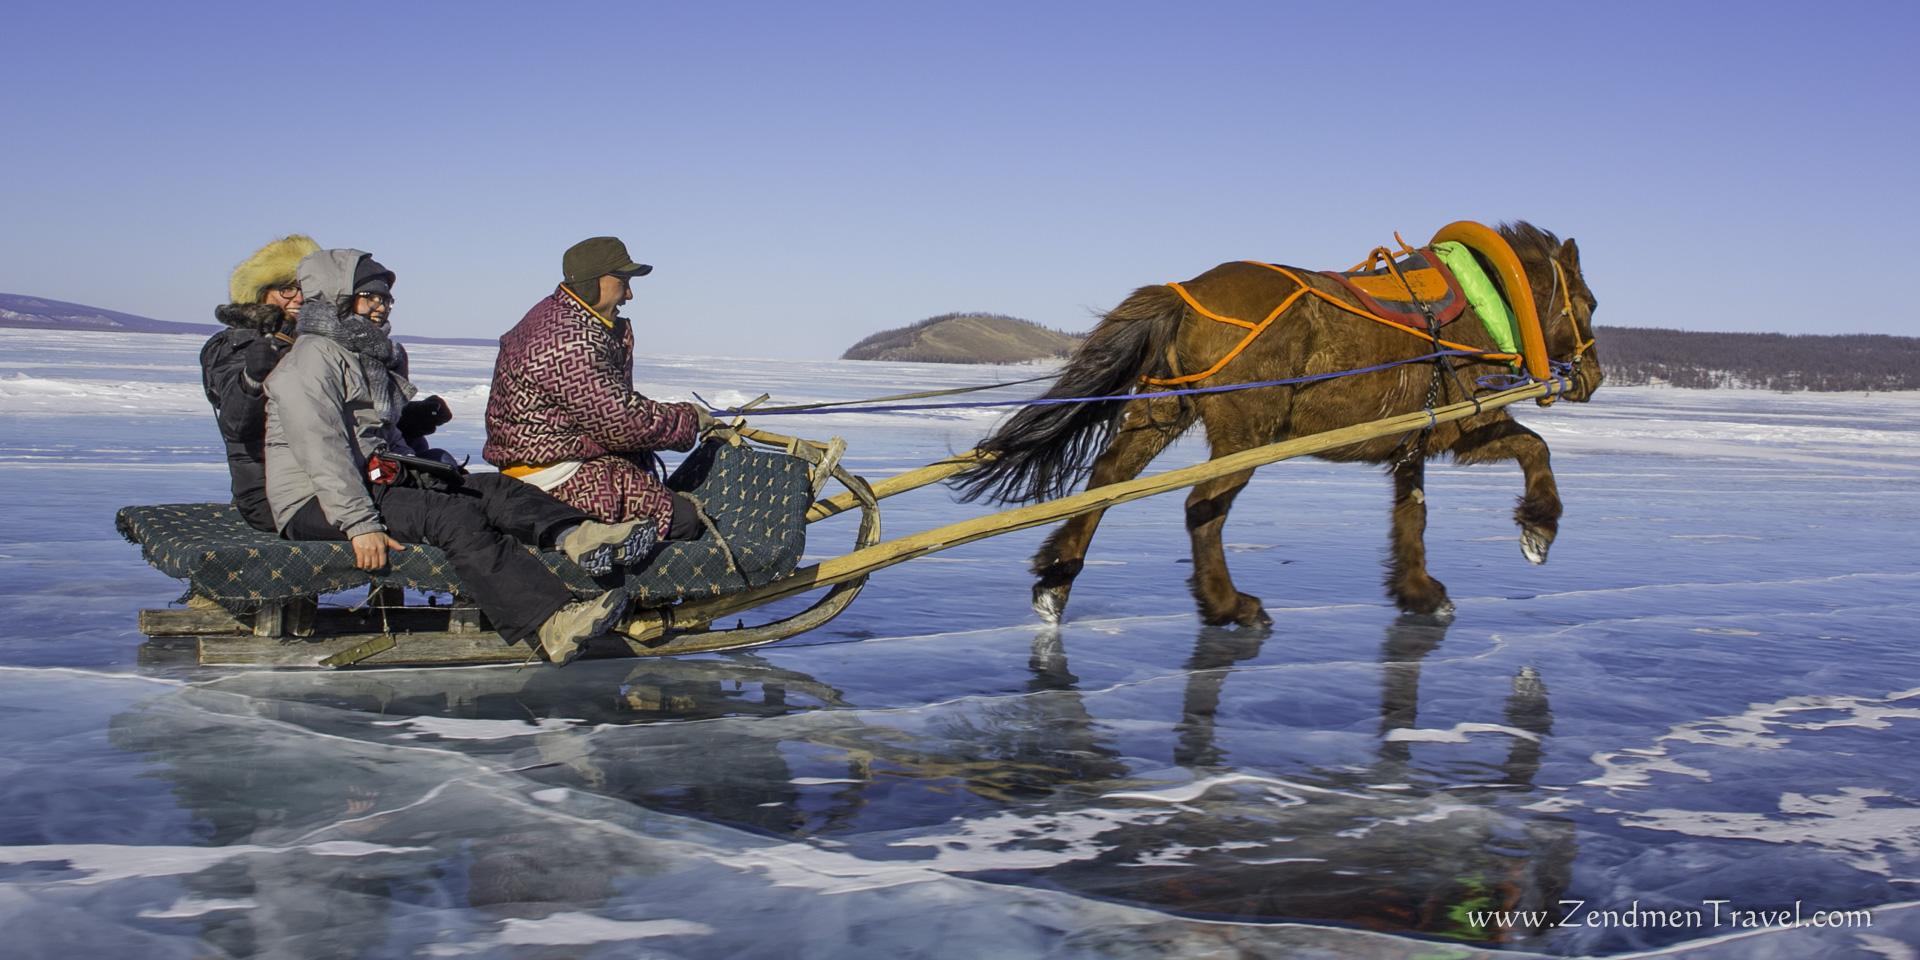 One Horse Open Sleigh Zendmen Travel Mongolia